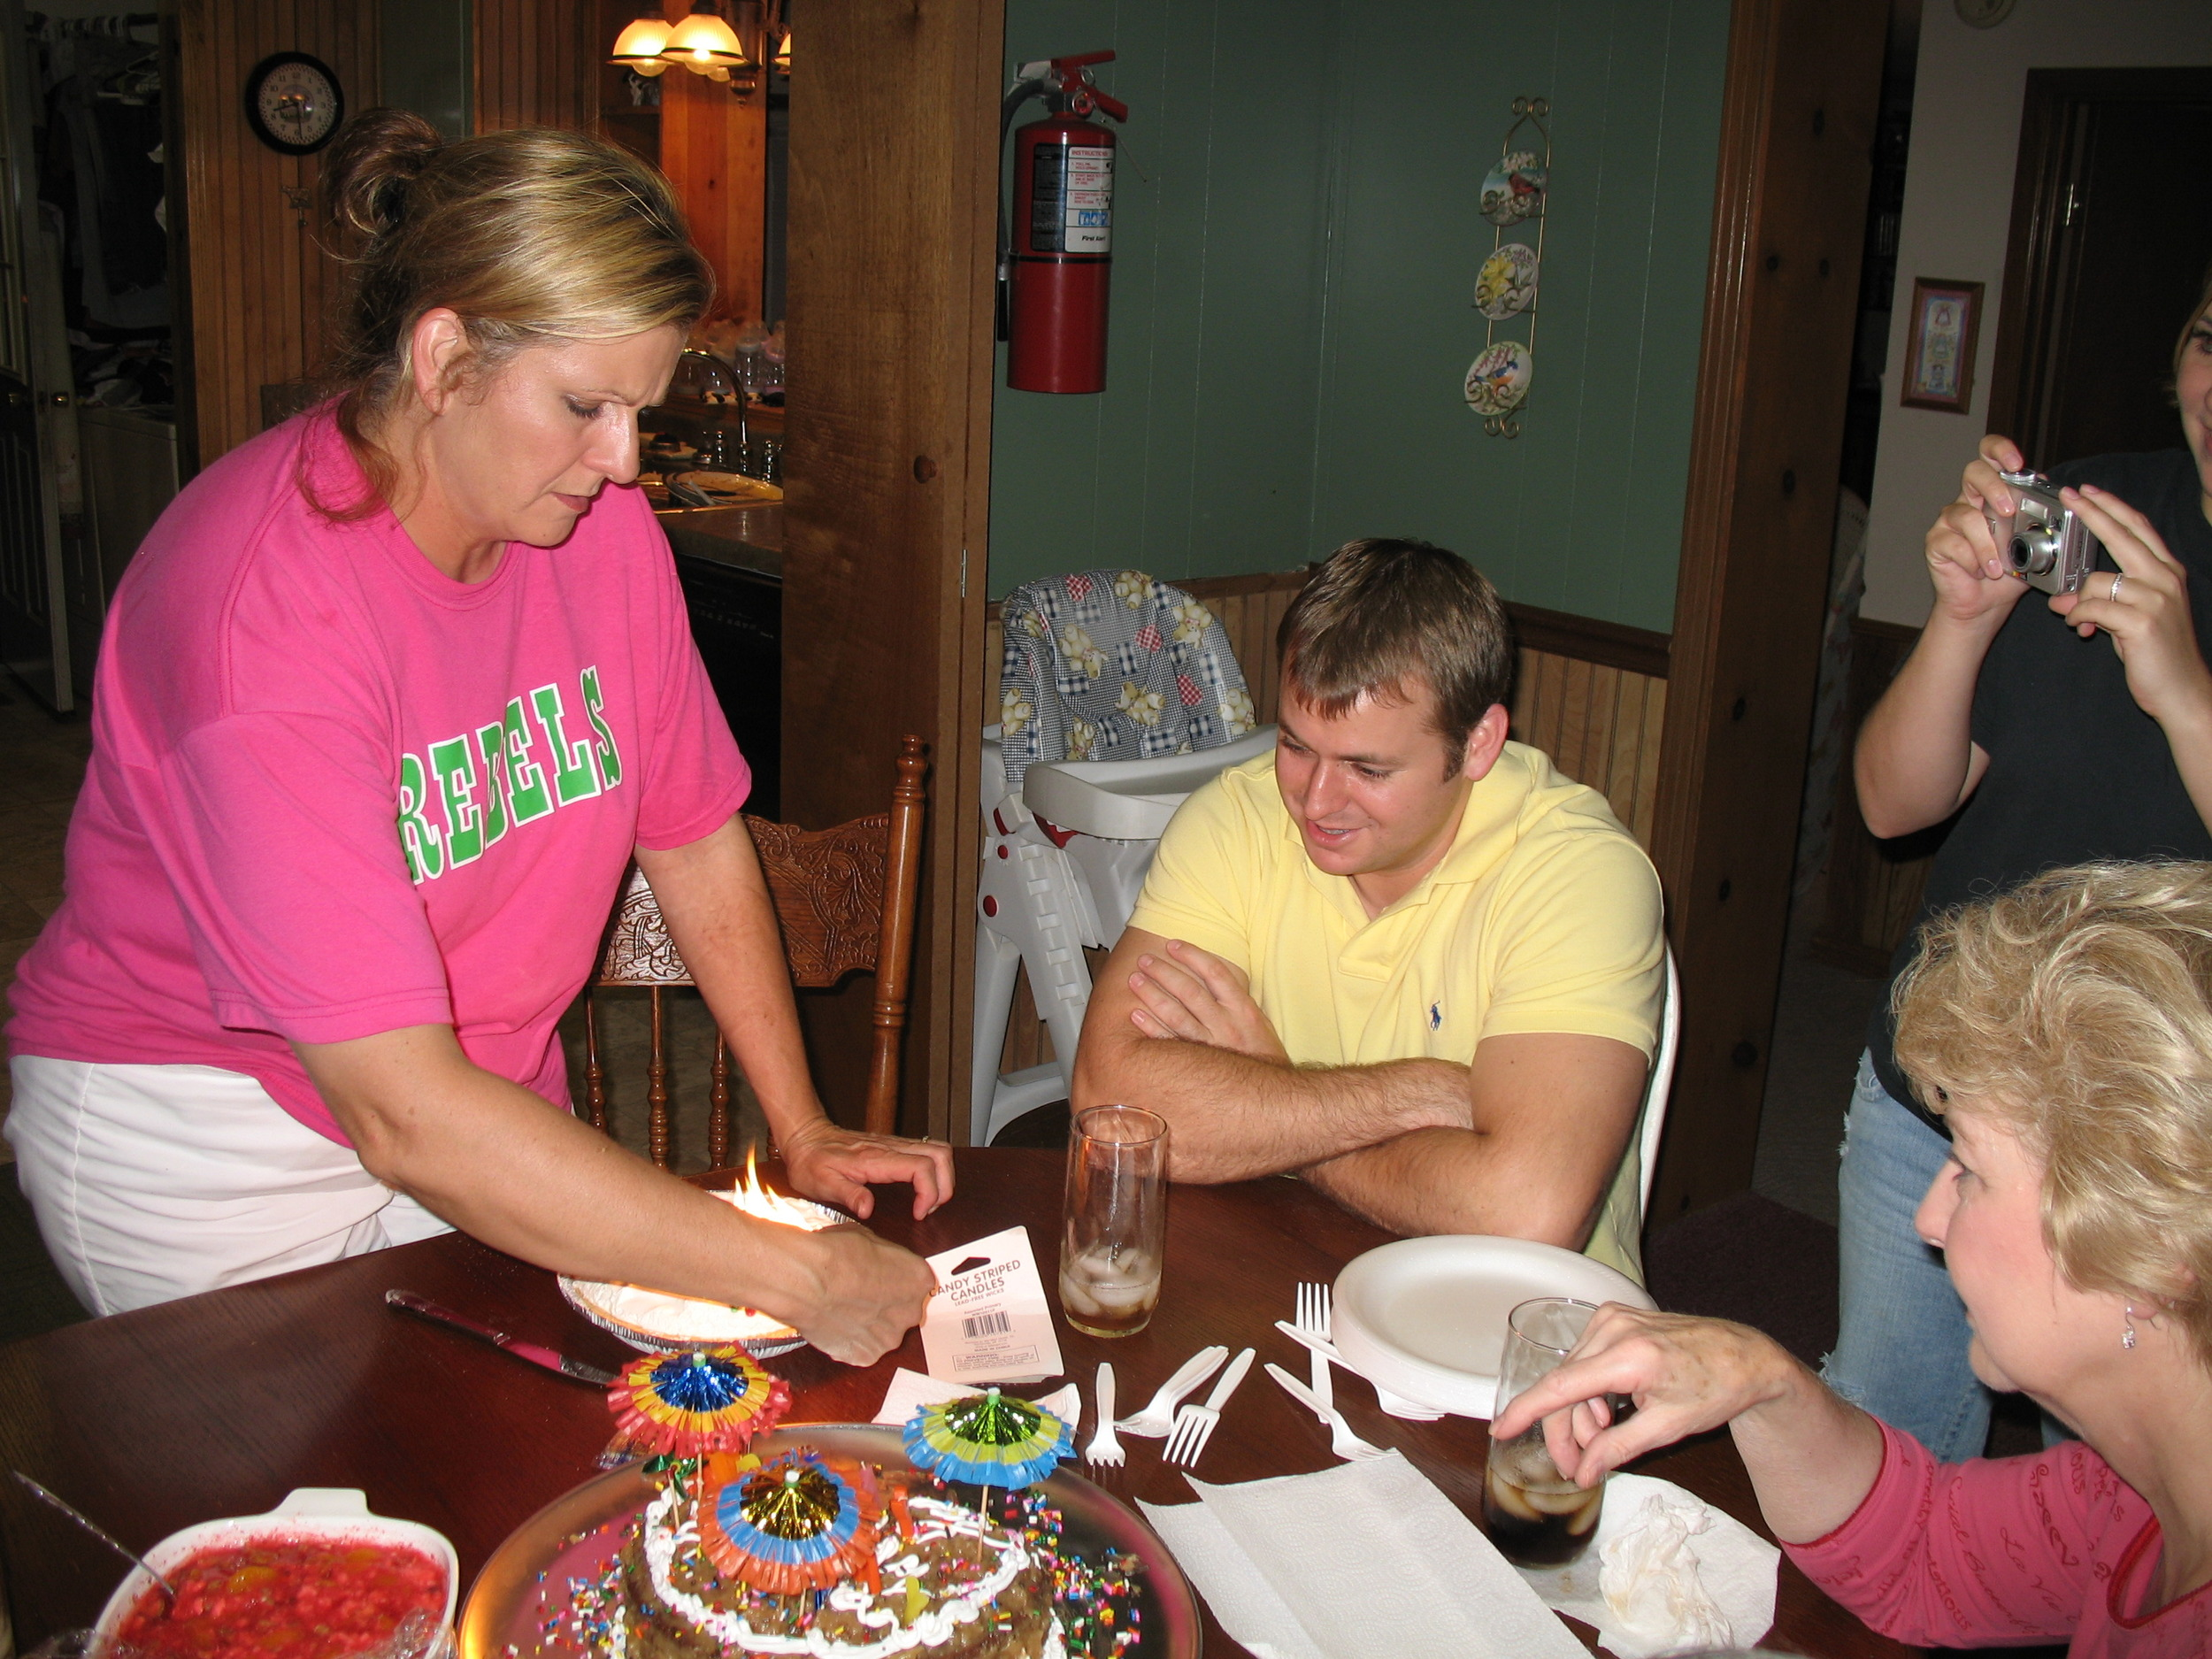 Denise, Jonathan and Sadie, July 7, 2006.